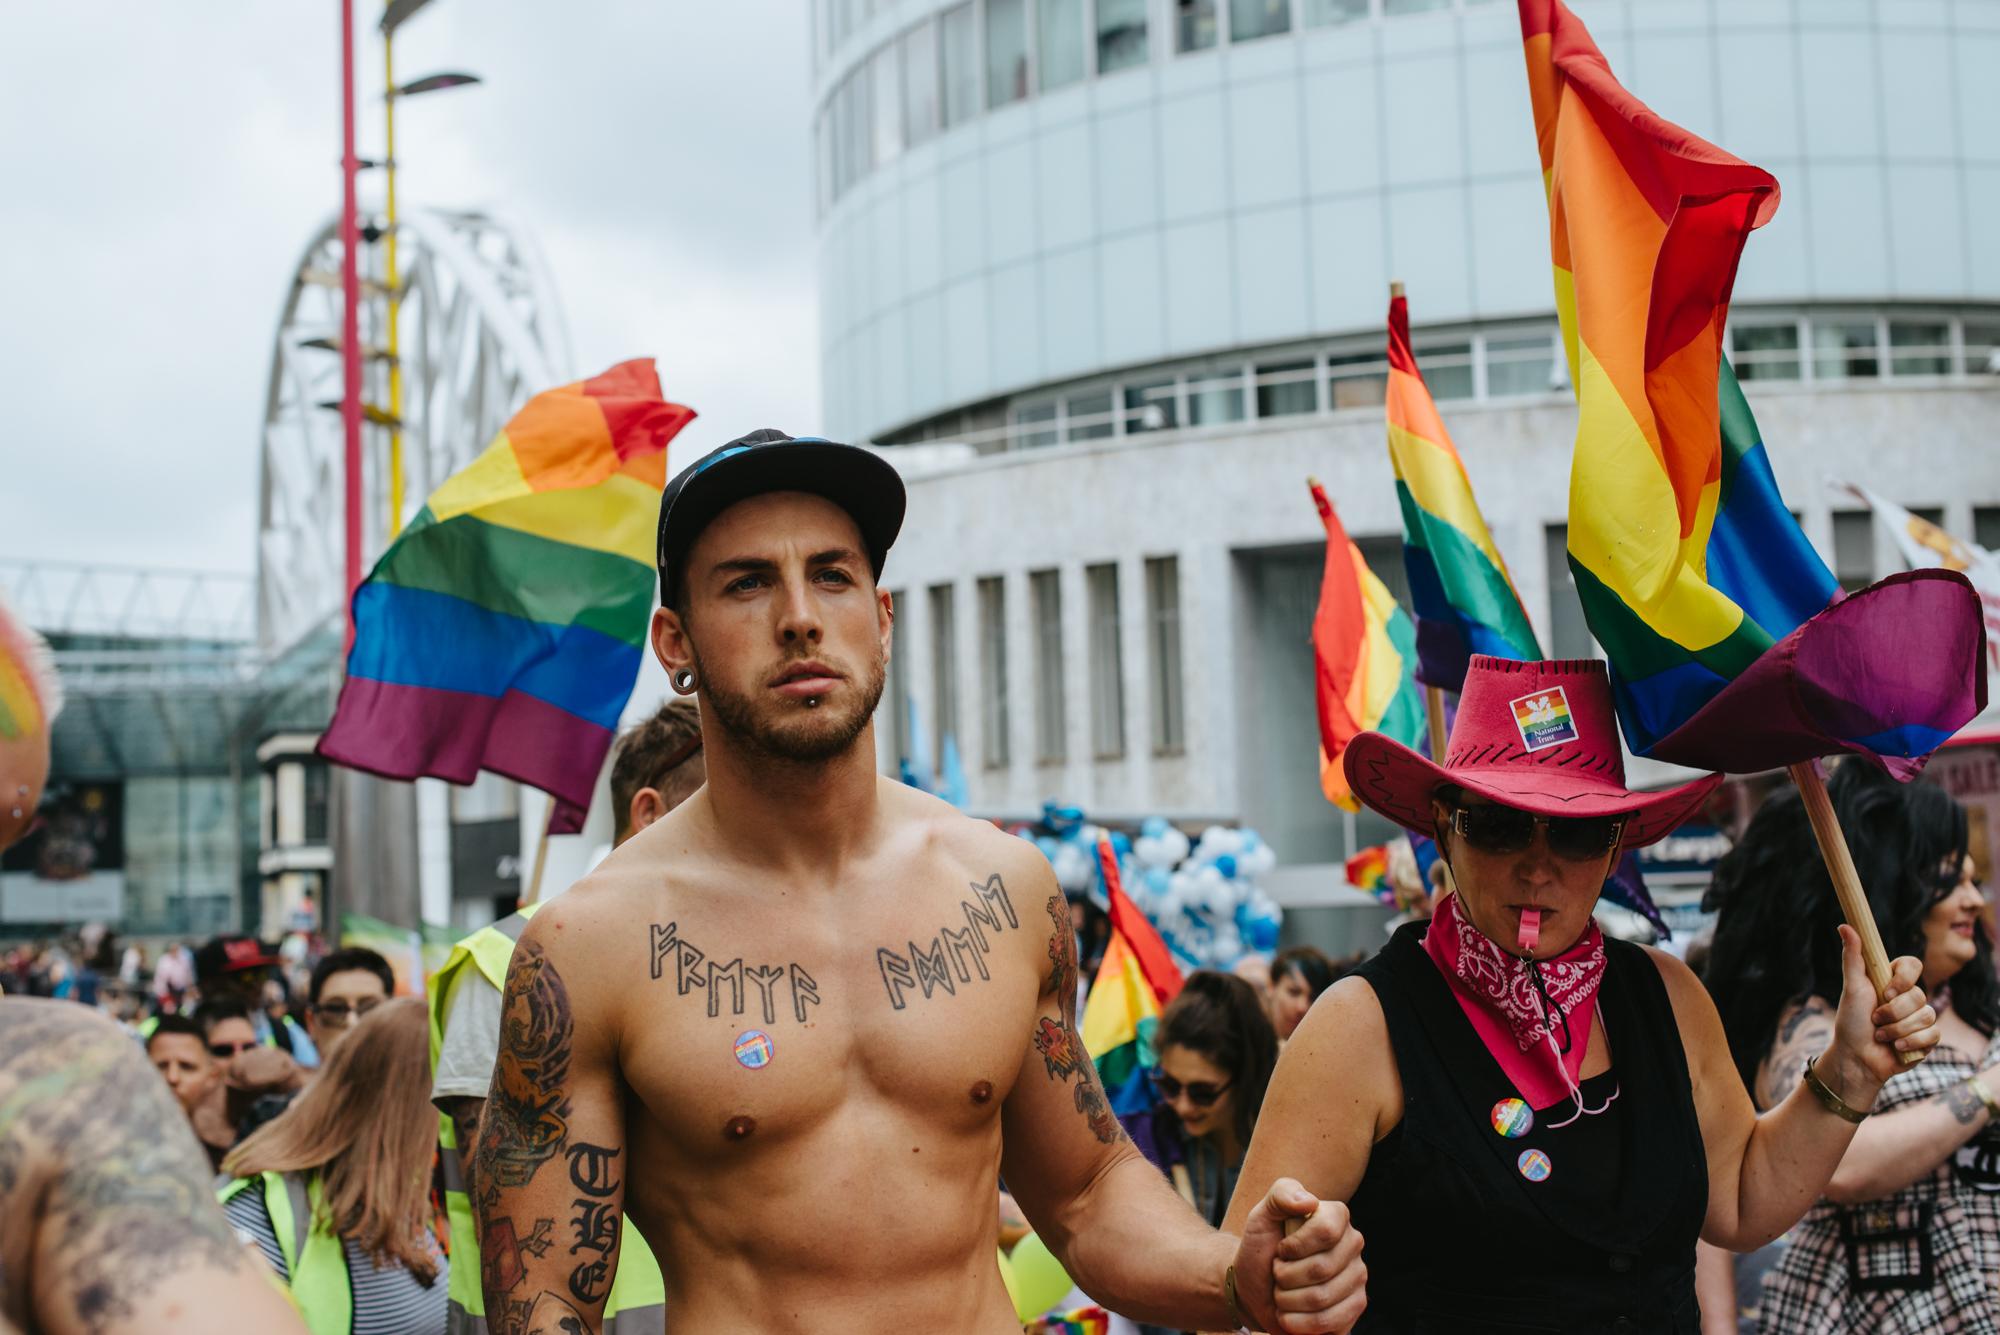 Birmingham-Pride-Parade-20170527-0280-Hanny-Foxhall.jpg